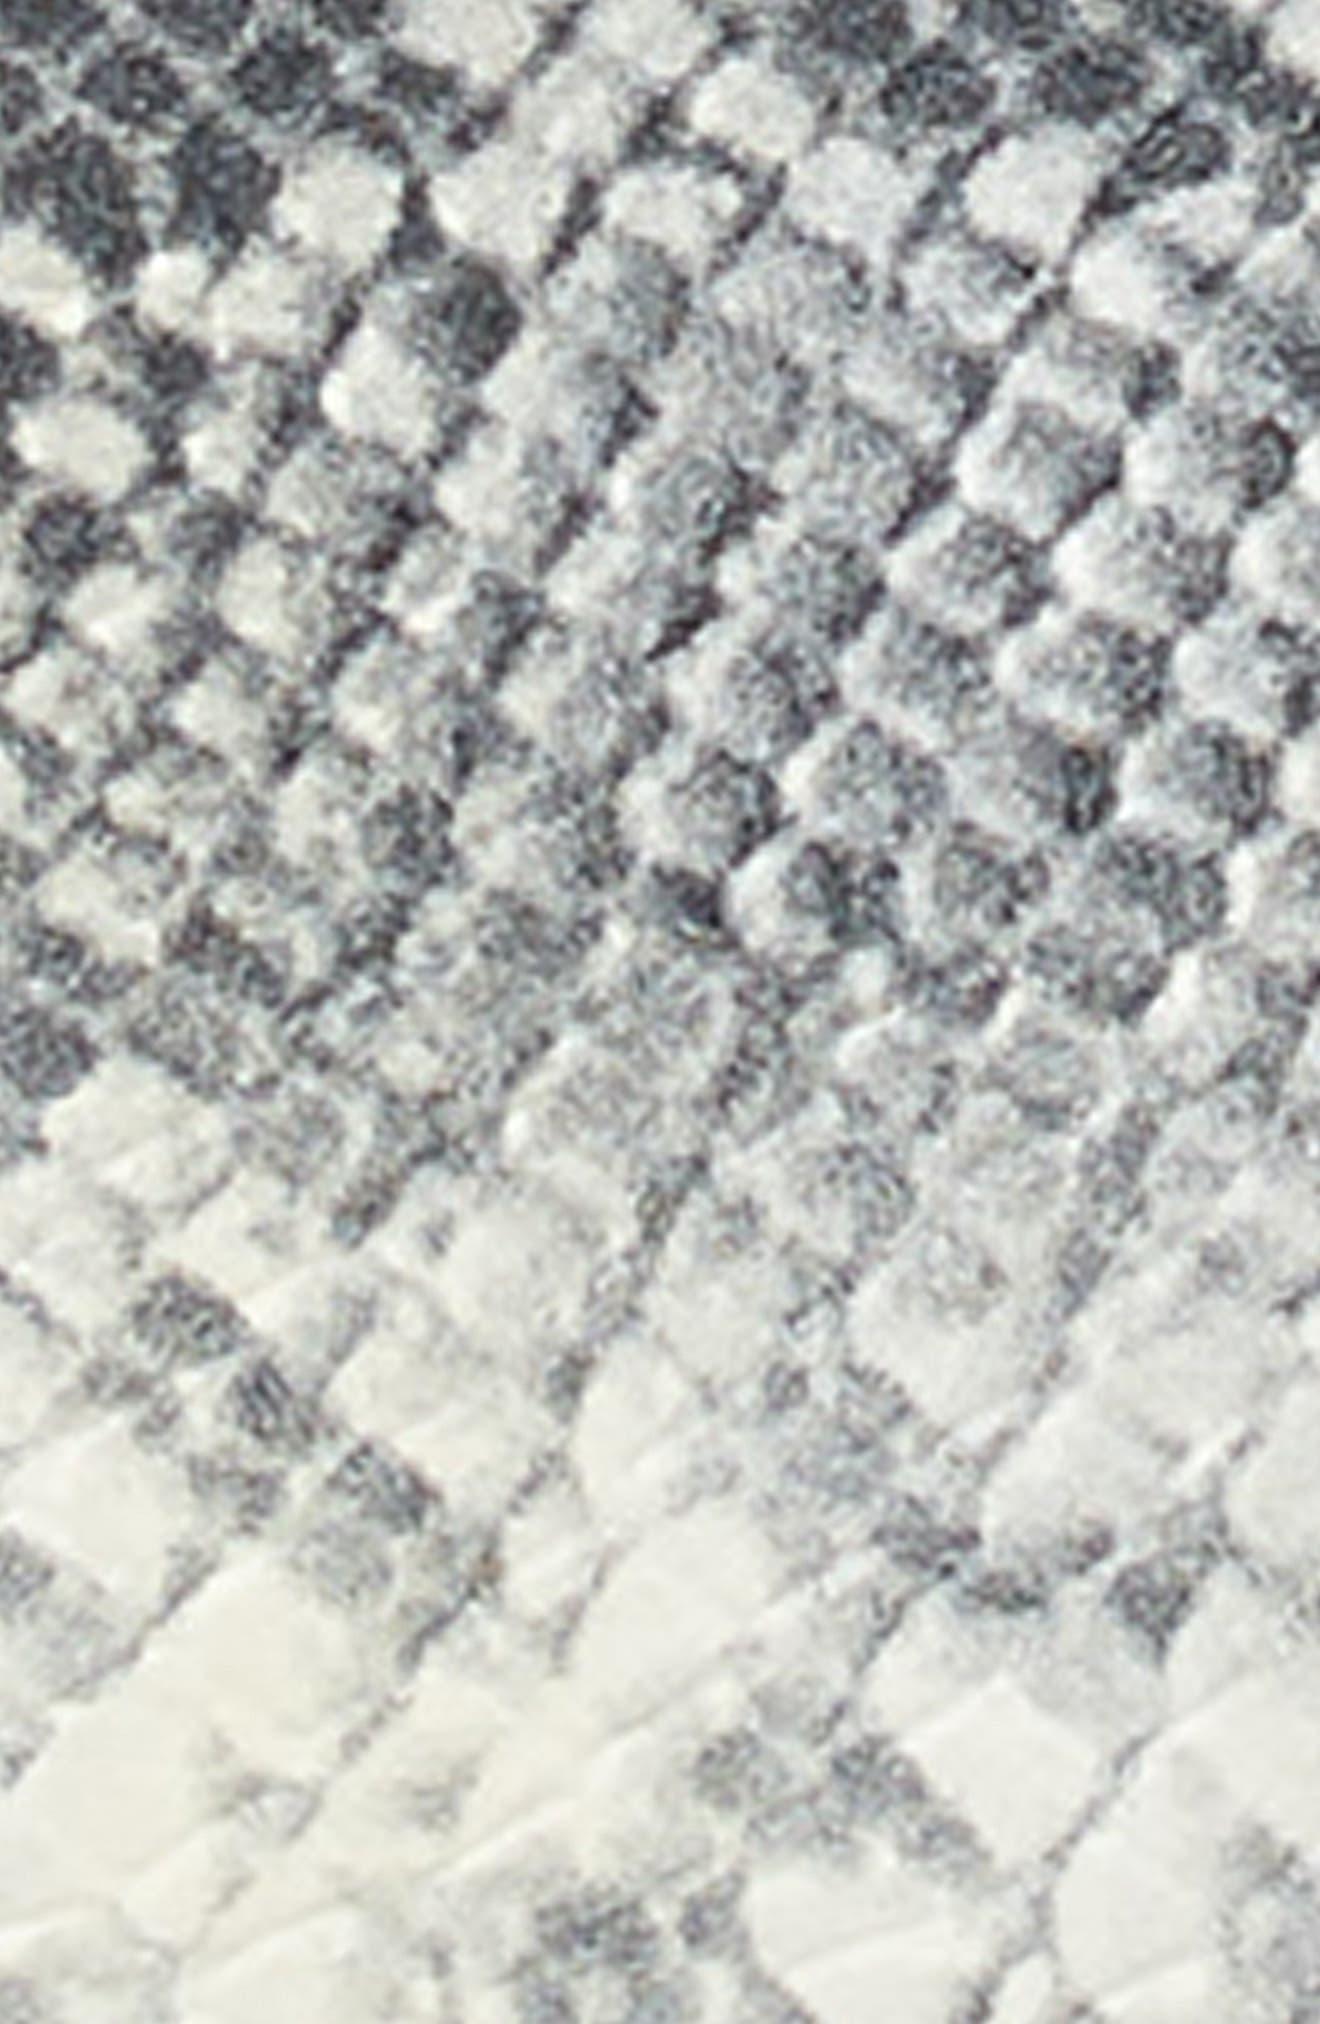 Snakeskin Embossed Faux Leather Belt,                             Alternate thumbnail 3, color,                             GREY